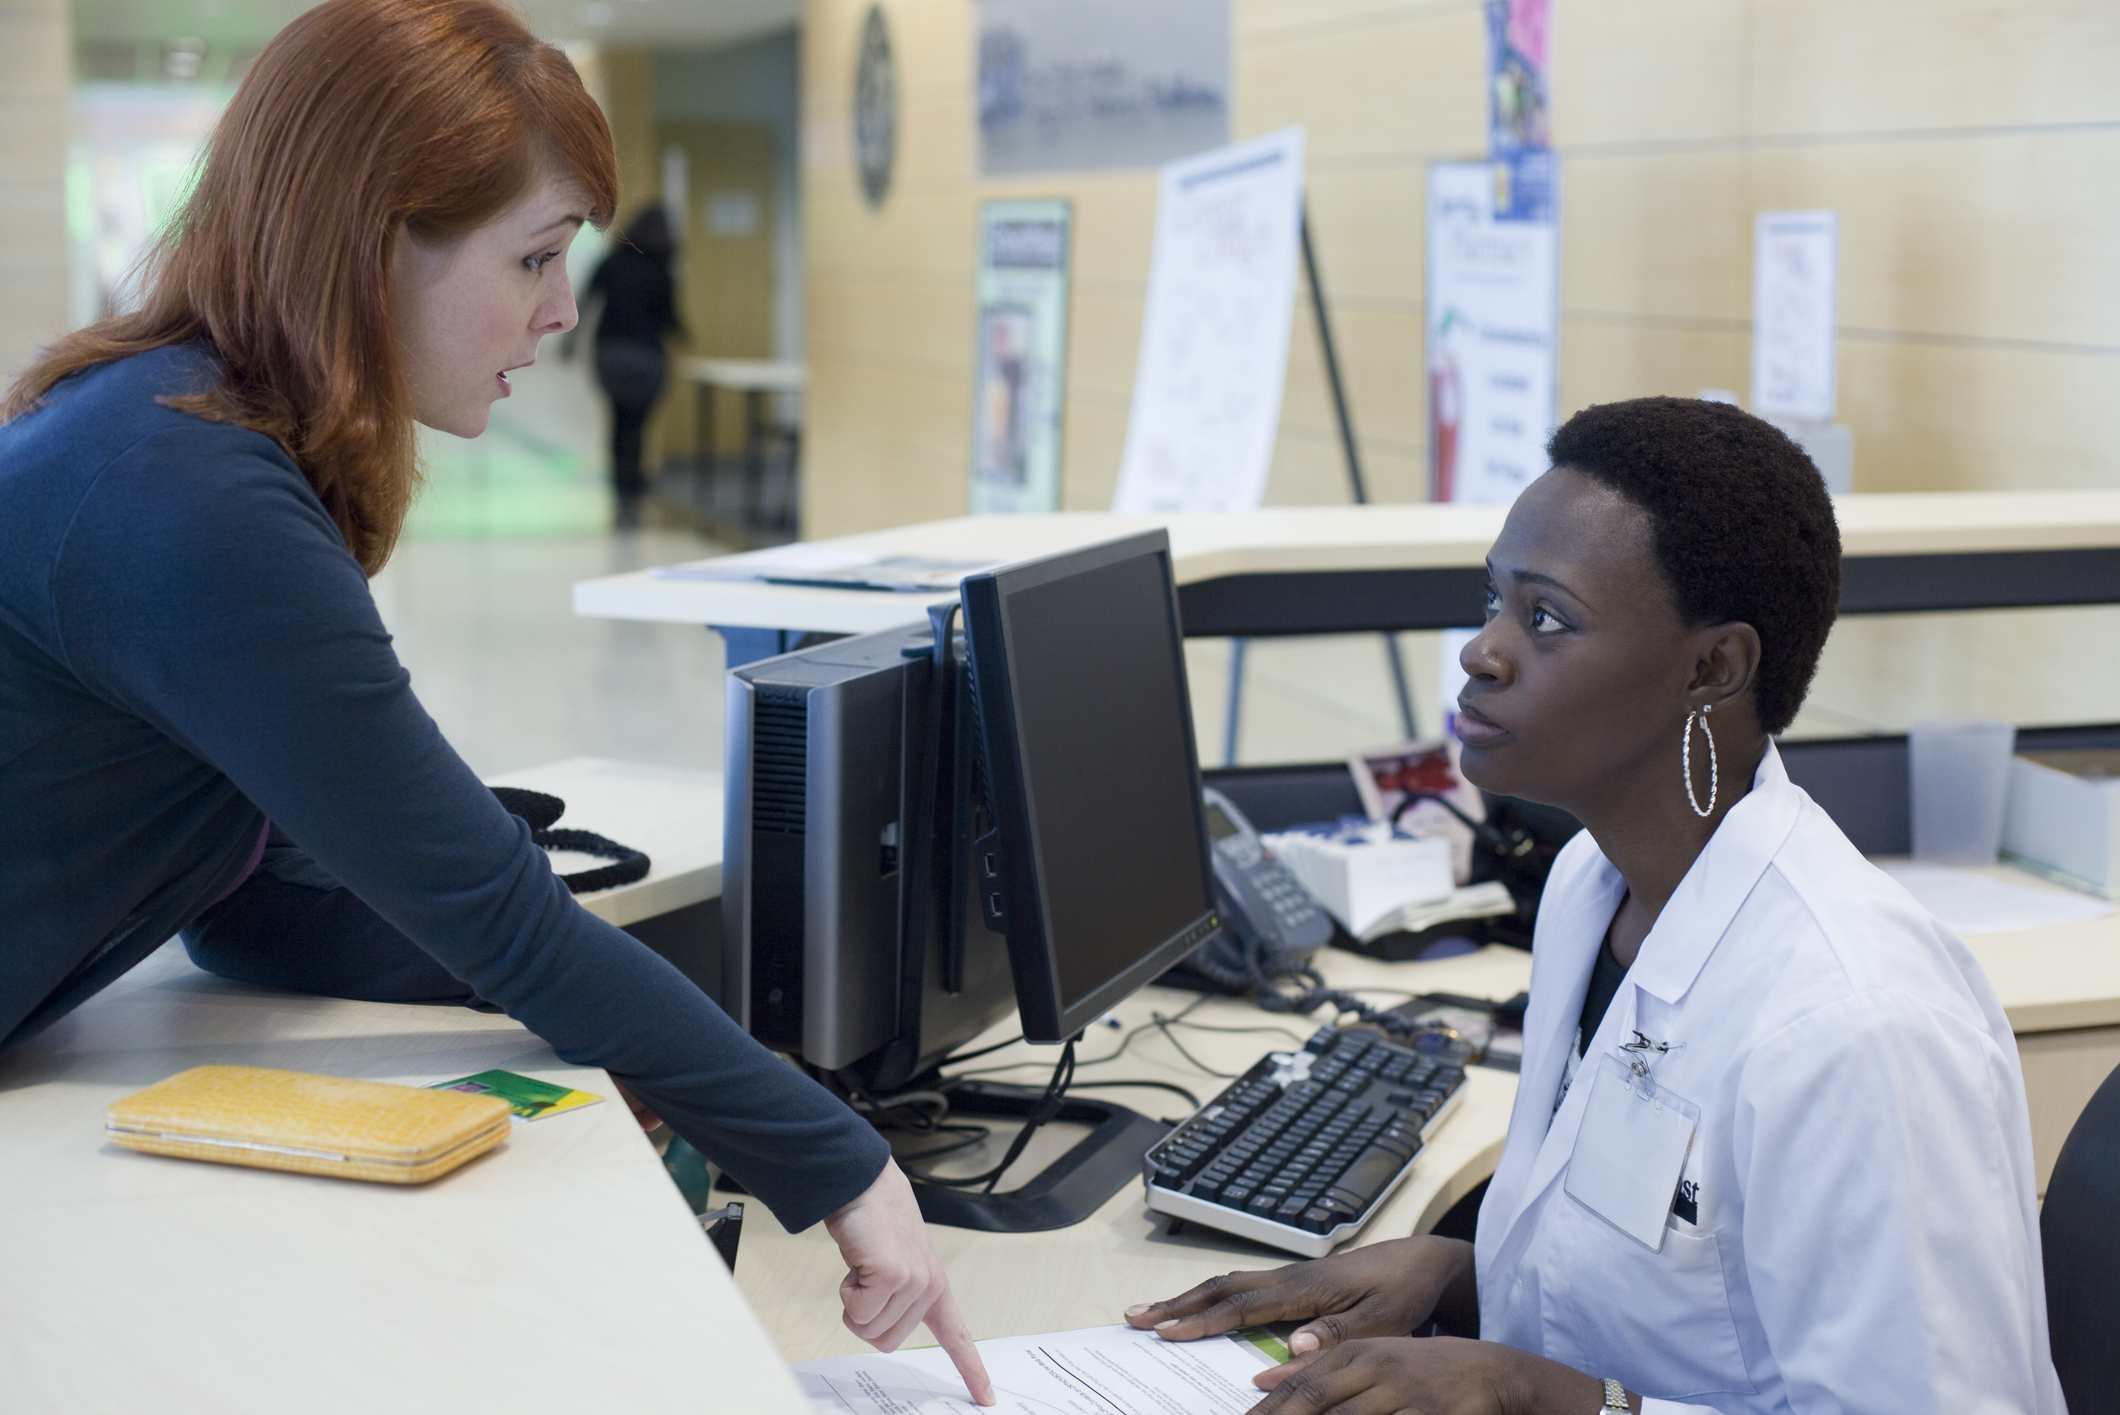 Upset patient explaining problem to medical receptionist